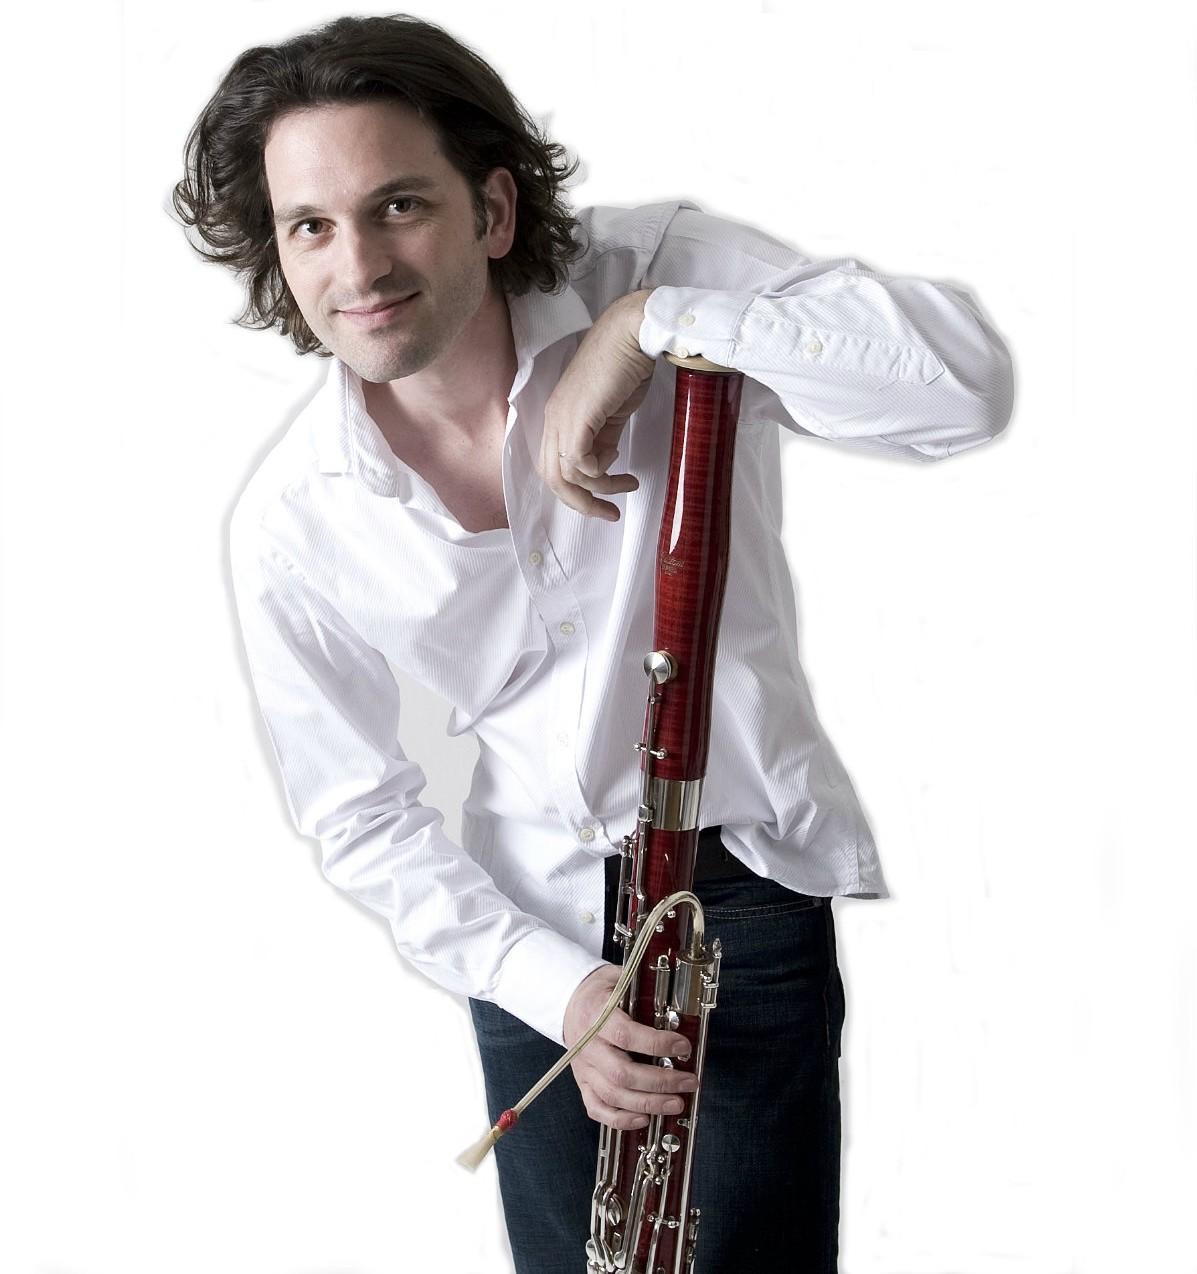 Christoph-Mario Veit